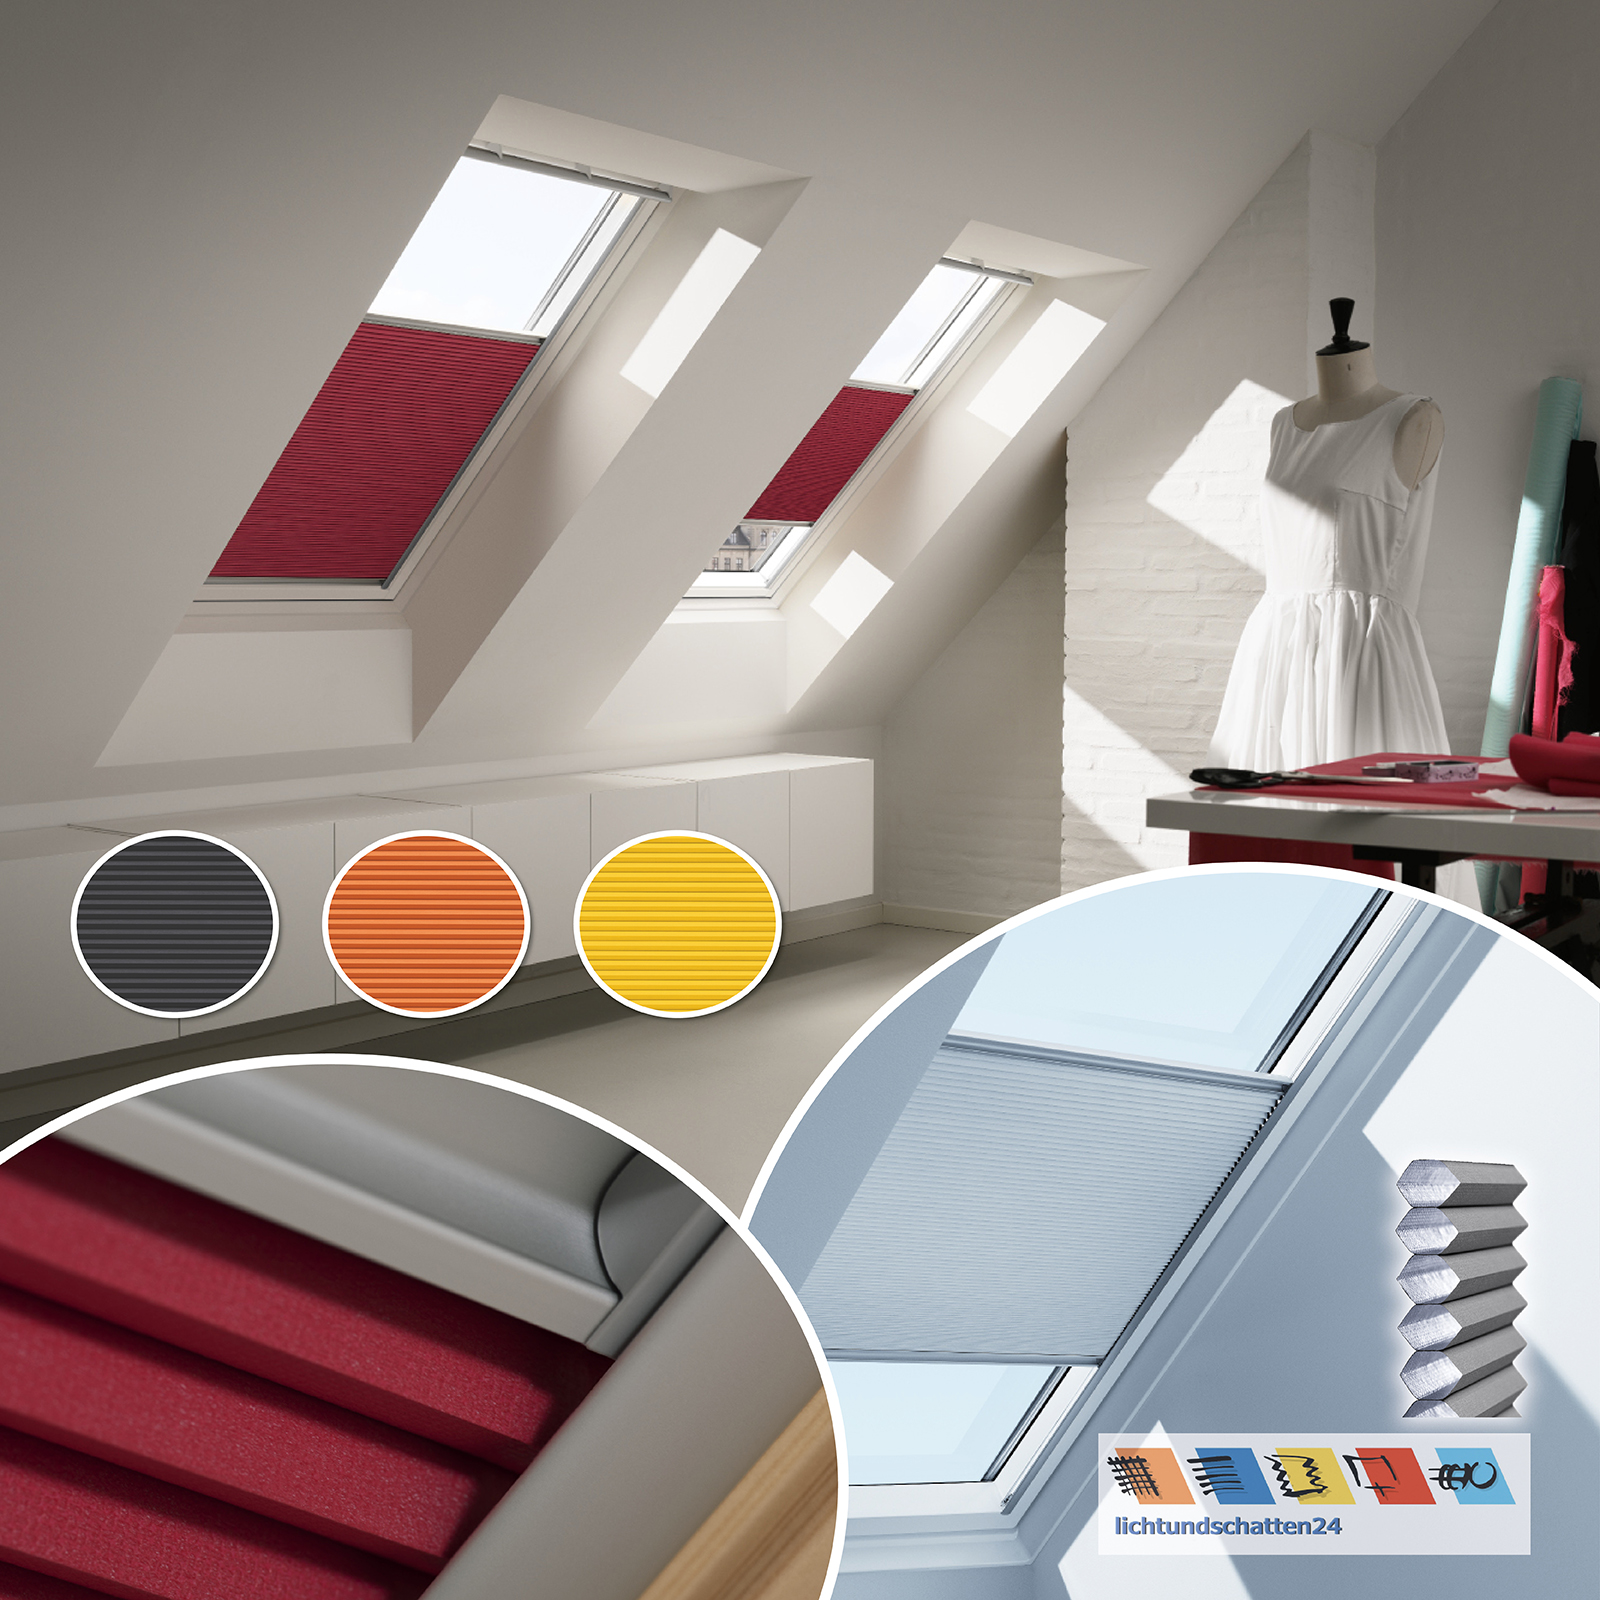 orig velux dachfenster wabenplissee gelb orange schwarz ggu gpu ghu gtu gxu ggl ebay. Black Bedroom Furniture Sets. Home Design Ideas